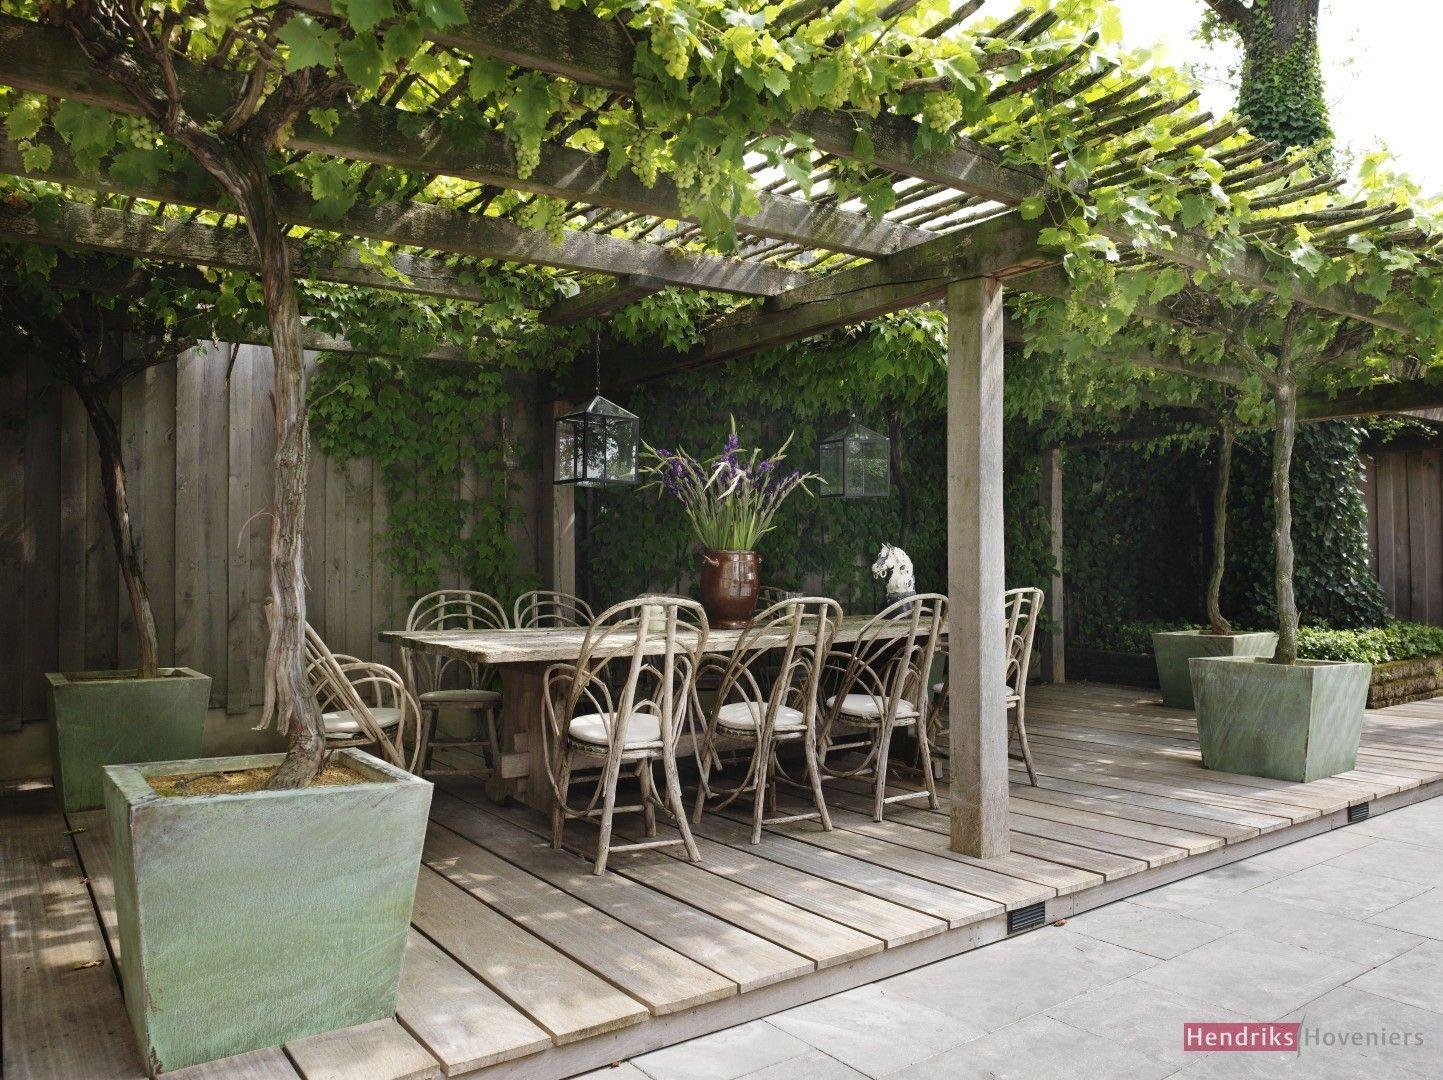 Pergola In Tuin : Mooie tuin ideeen gezellig beschut plekje in de tuin mooi leuke